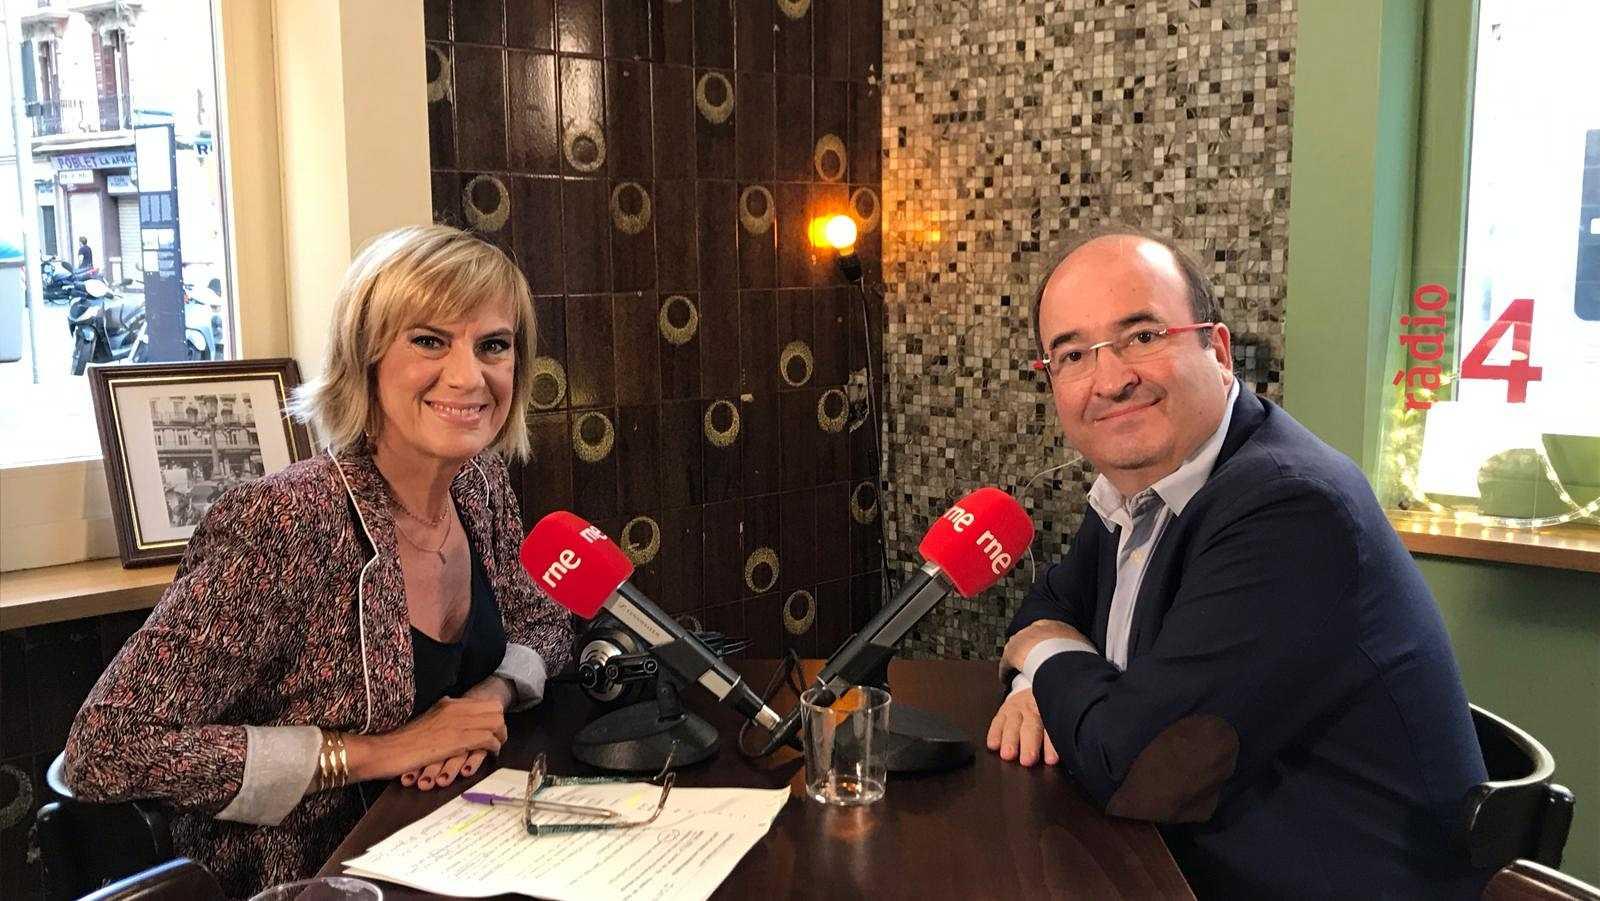 Gema Nierga entrevista Miquel Iceta